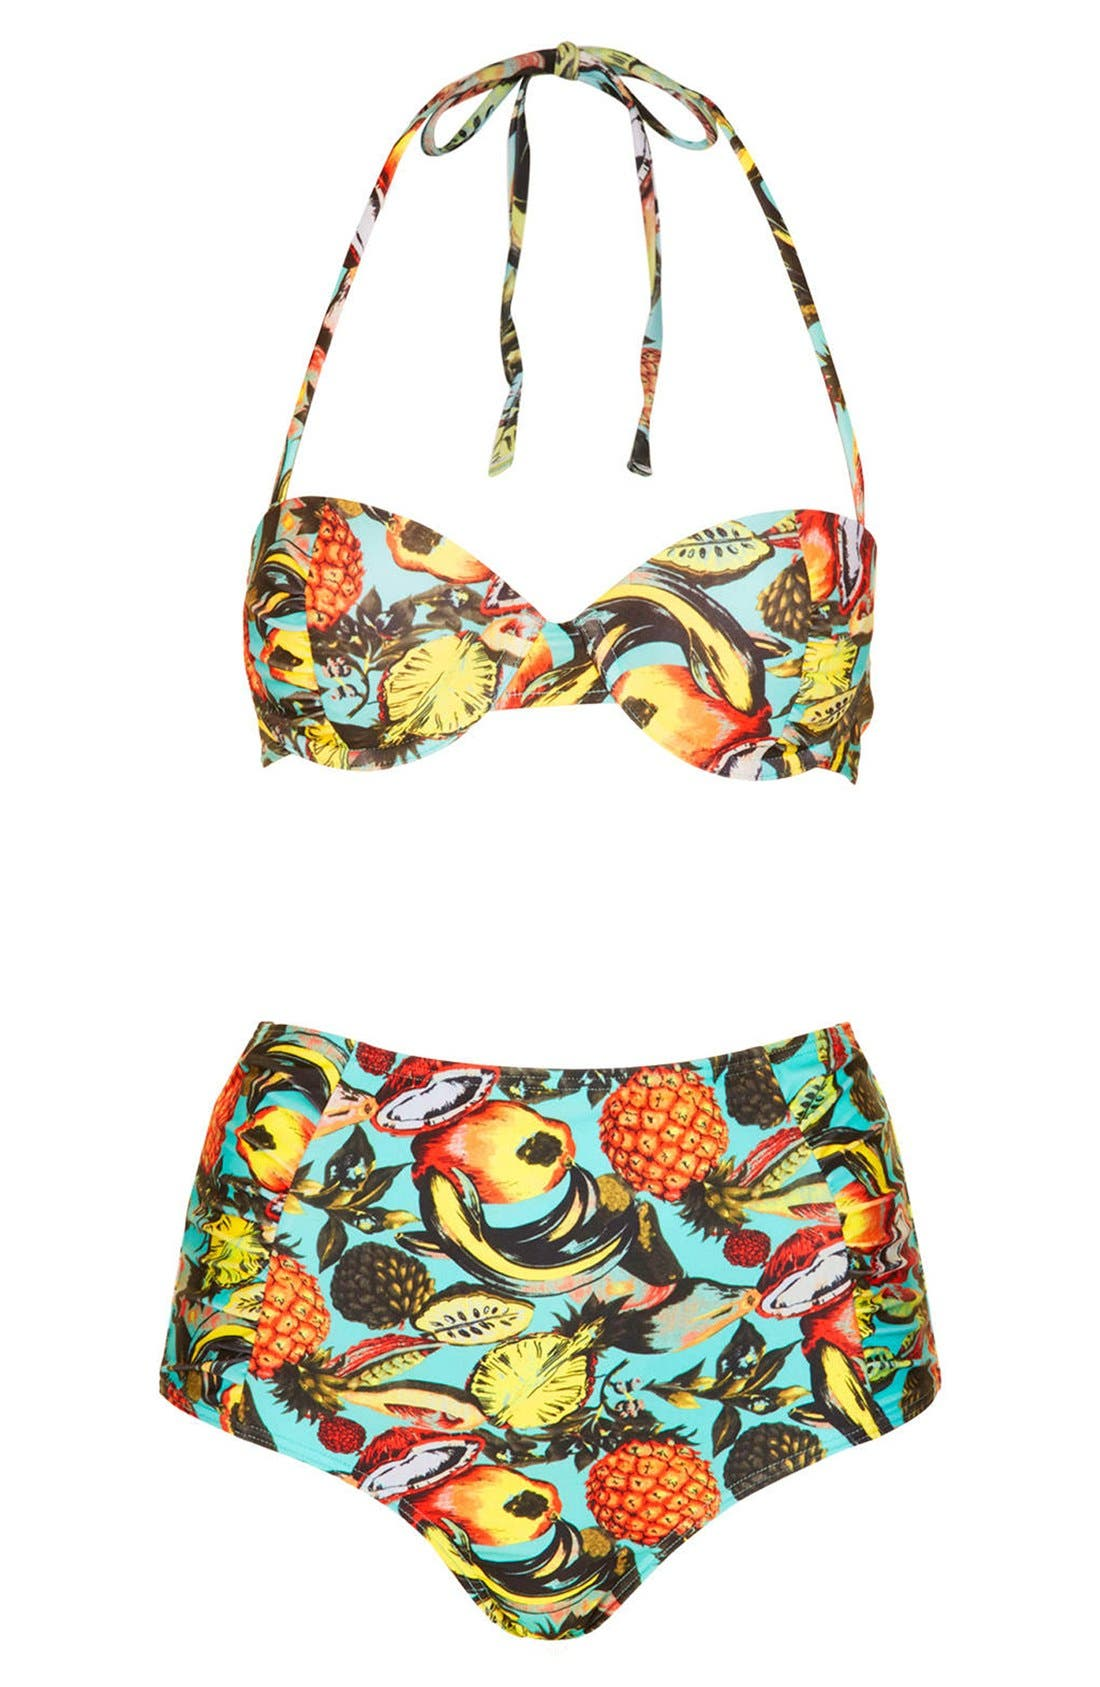 Alternate Image 1 Selected - Topshop Tropical Print High Rise Bikini